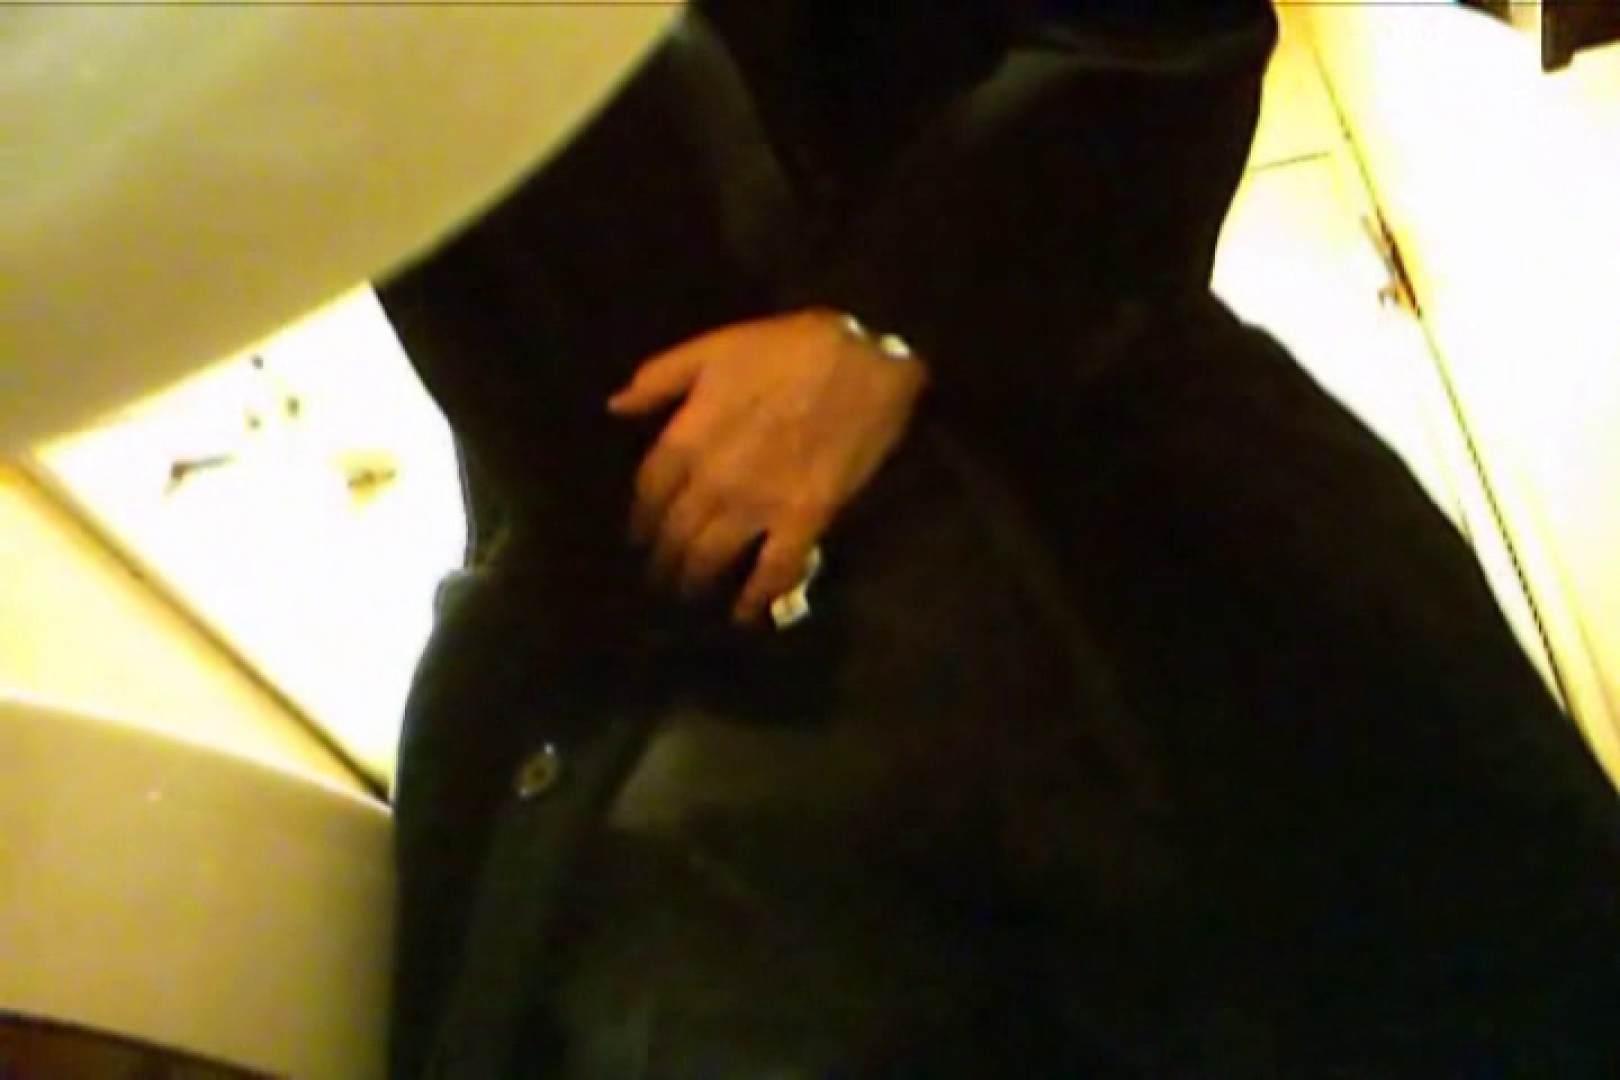 Gボーイ初投稿!掴み取りさんの洗面所覗き!in新幹線!VOL.15 念願の完全無修正 尻マンコ画像 81連発 11